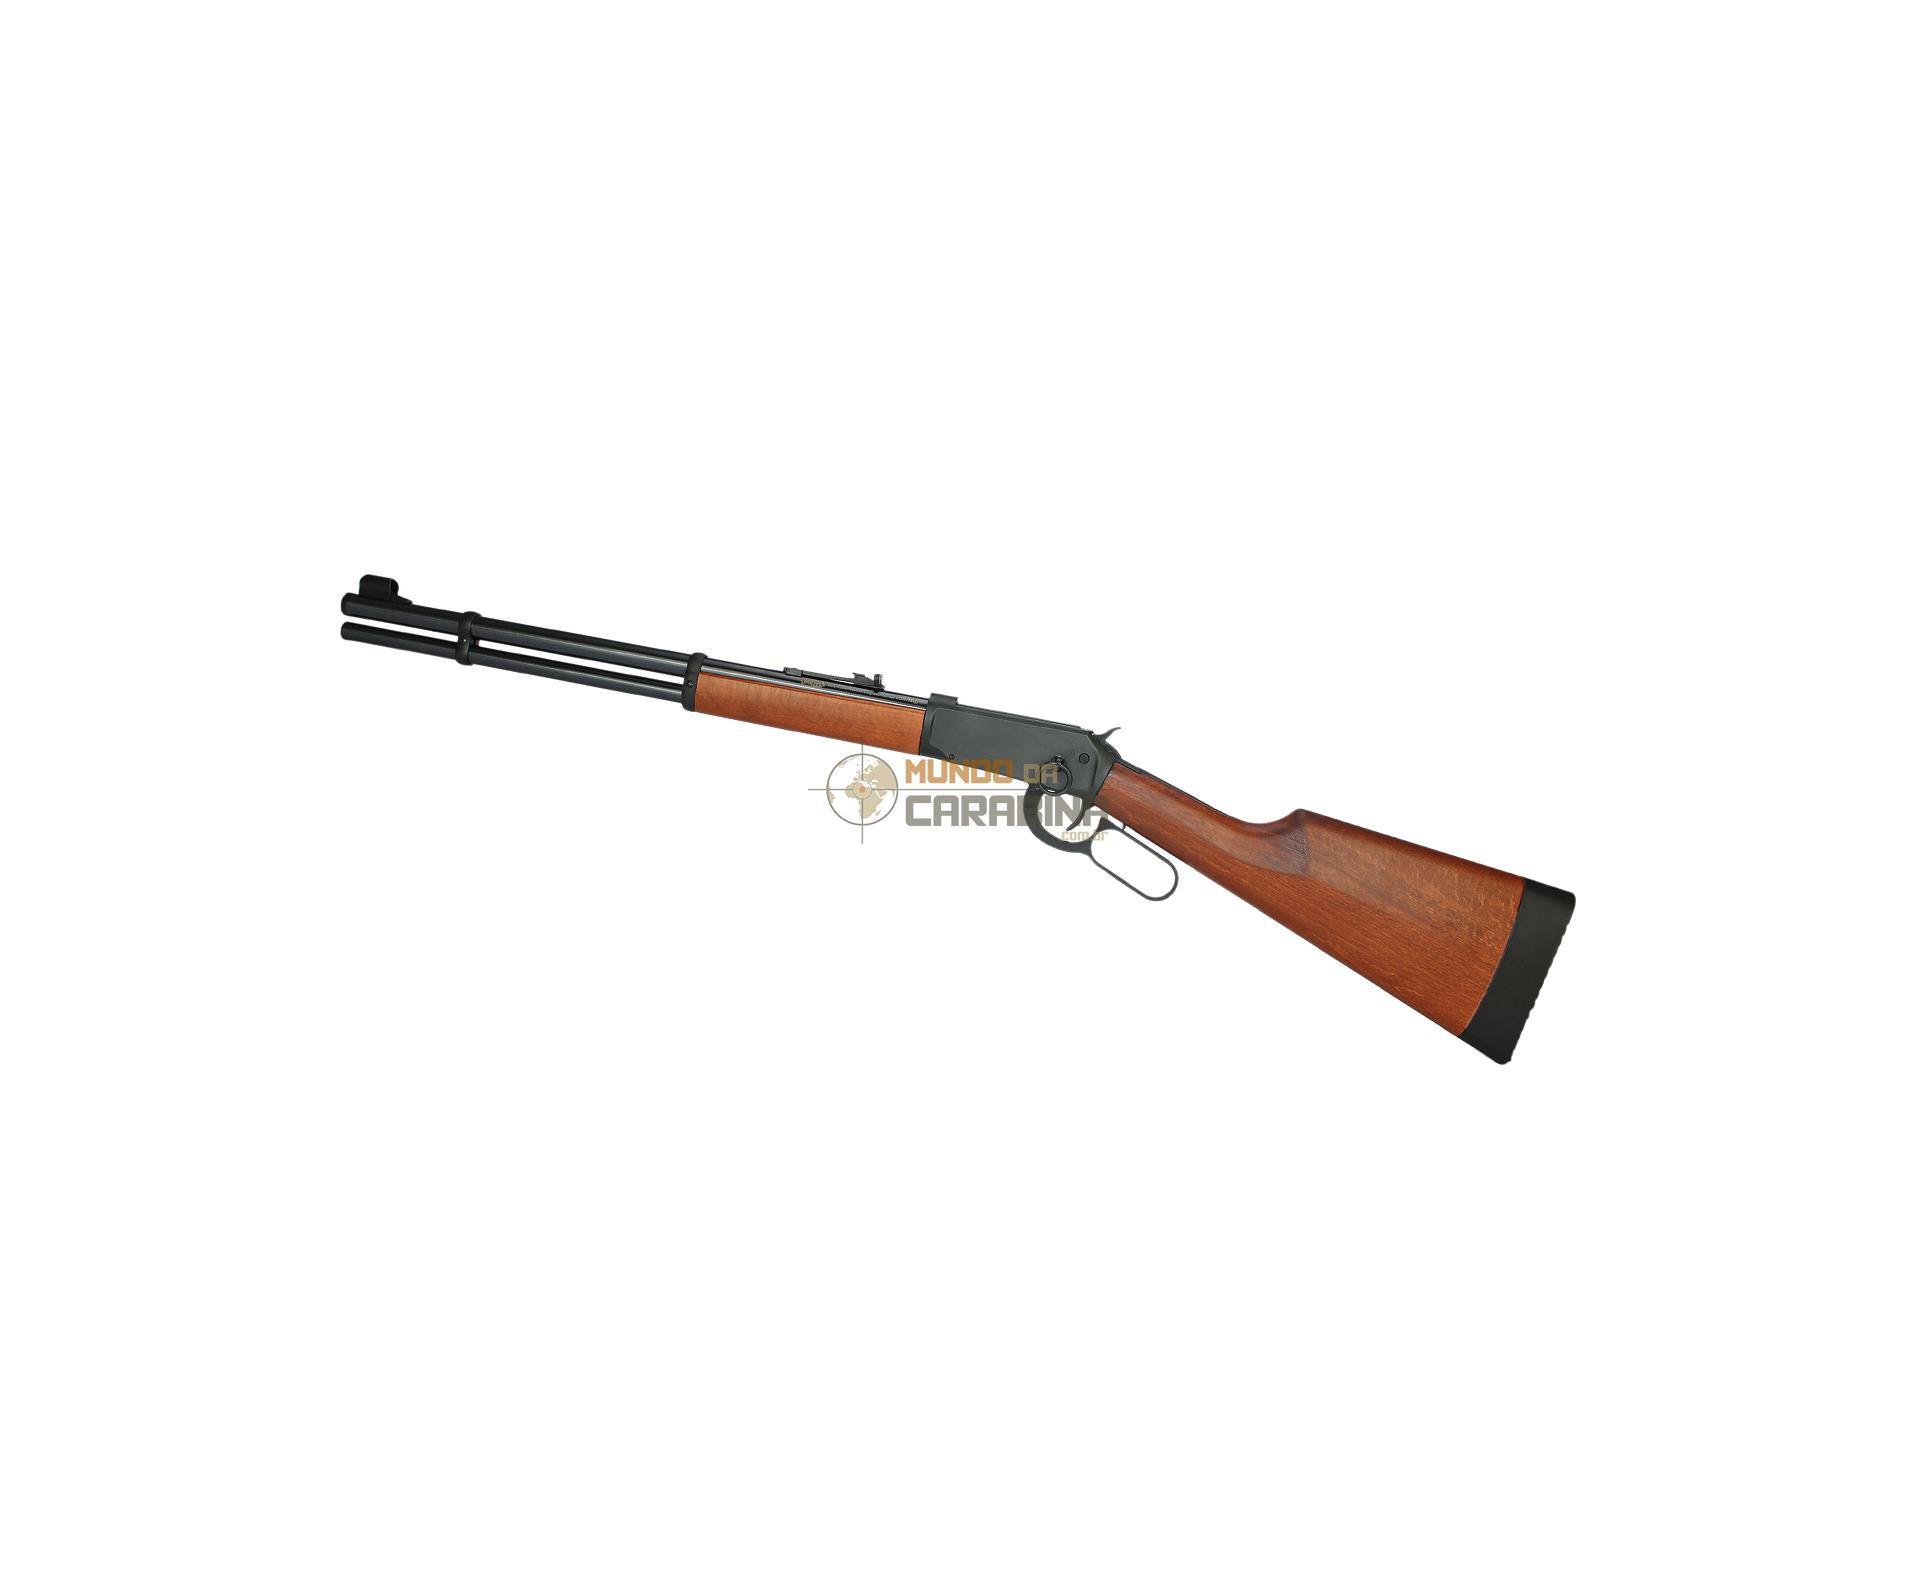 Carabina De Pressão Pcp Puma Walther Lever Action Oxidada 4,5mm 8 Tiros + Capa - Walther